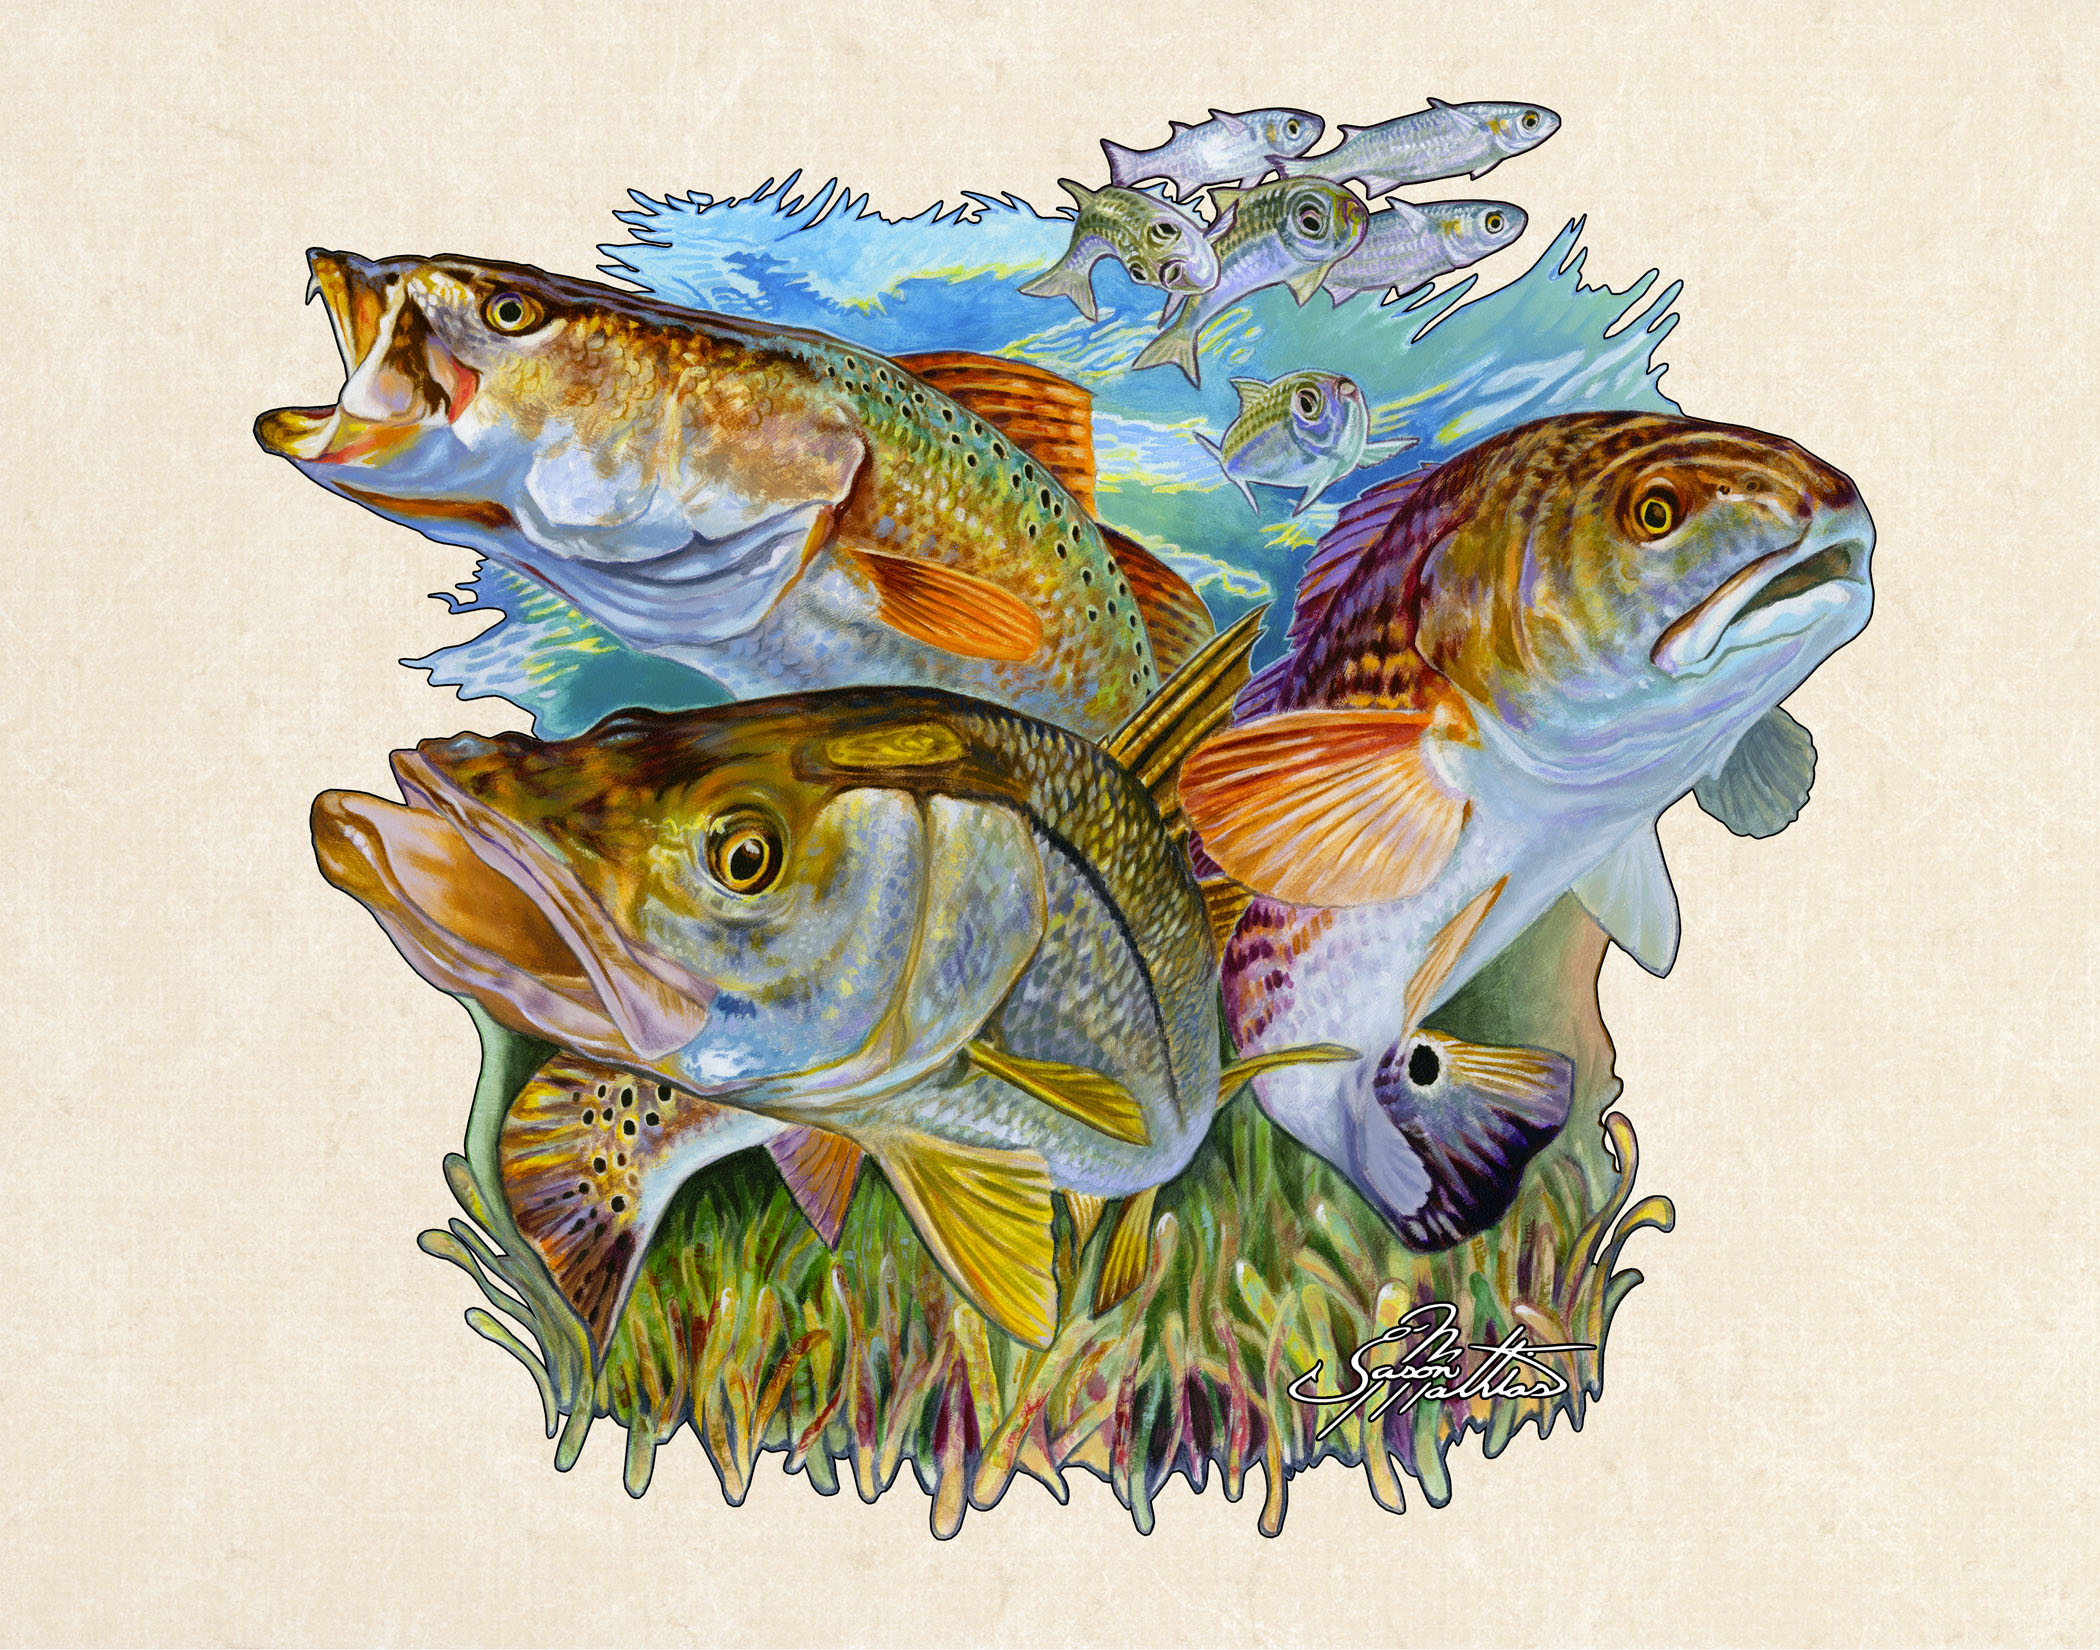 inshore-slam-snook-trout-redfish.jpg